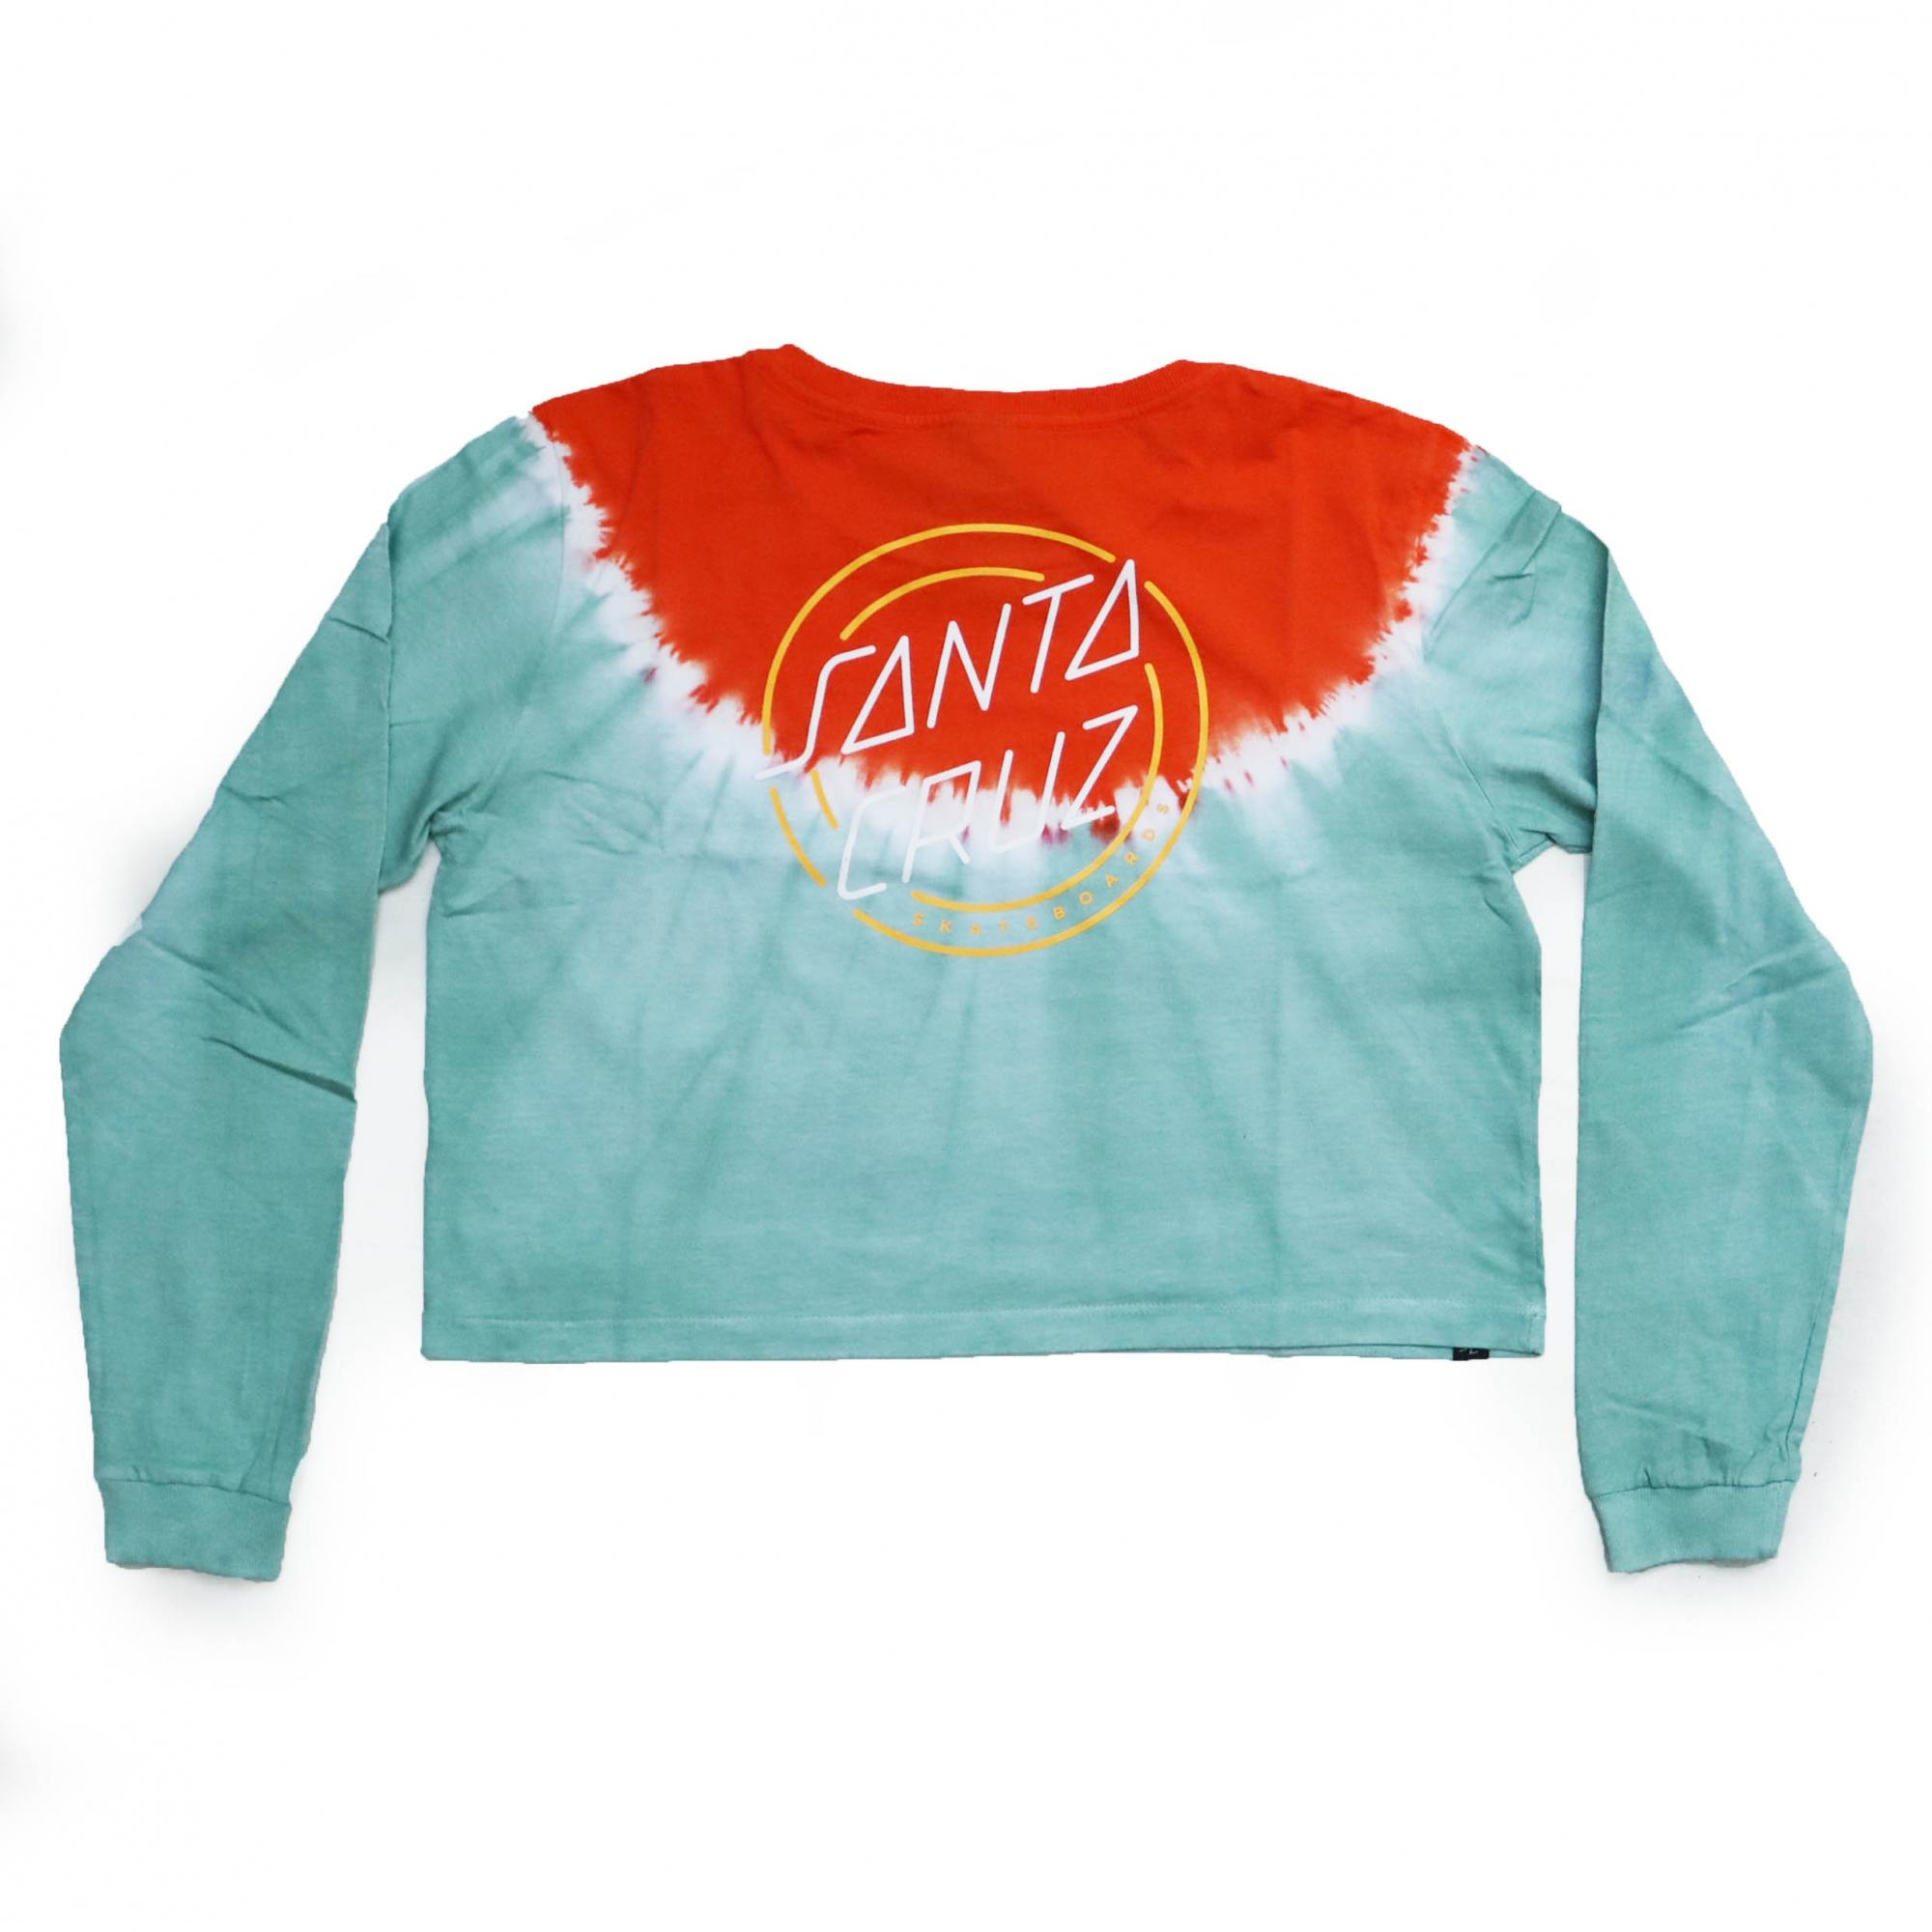 Camiseta Manga Longa Cropp Feminina Santa Cruz One Strok - Verde